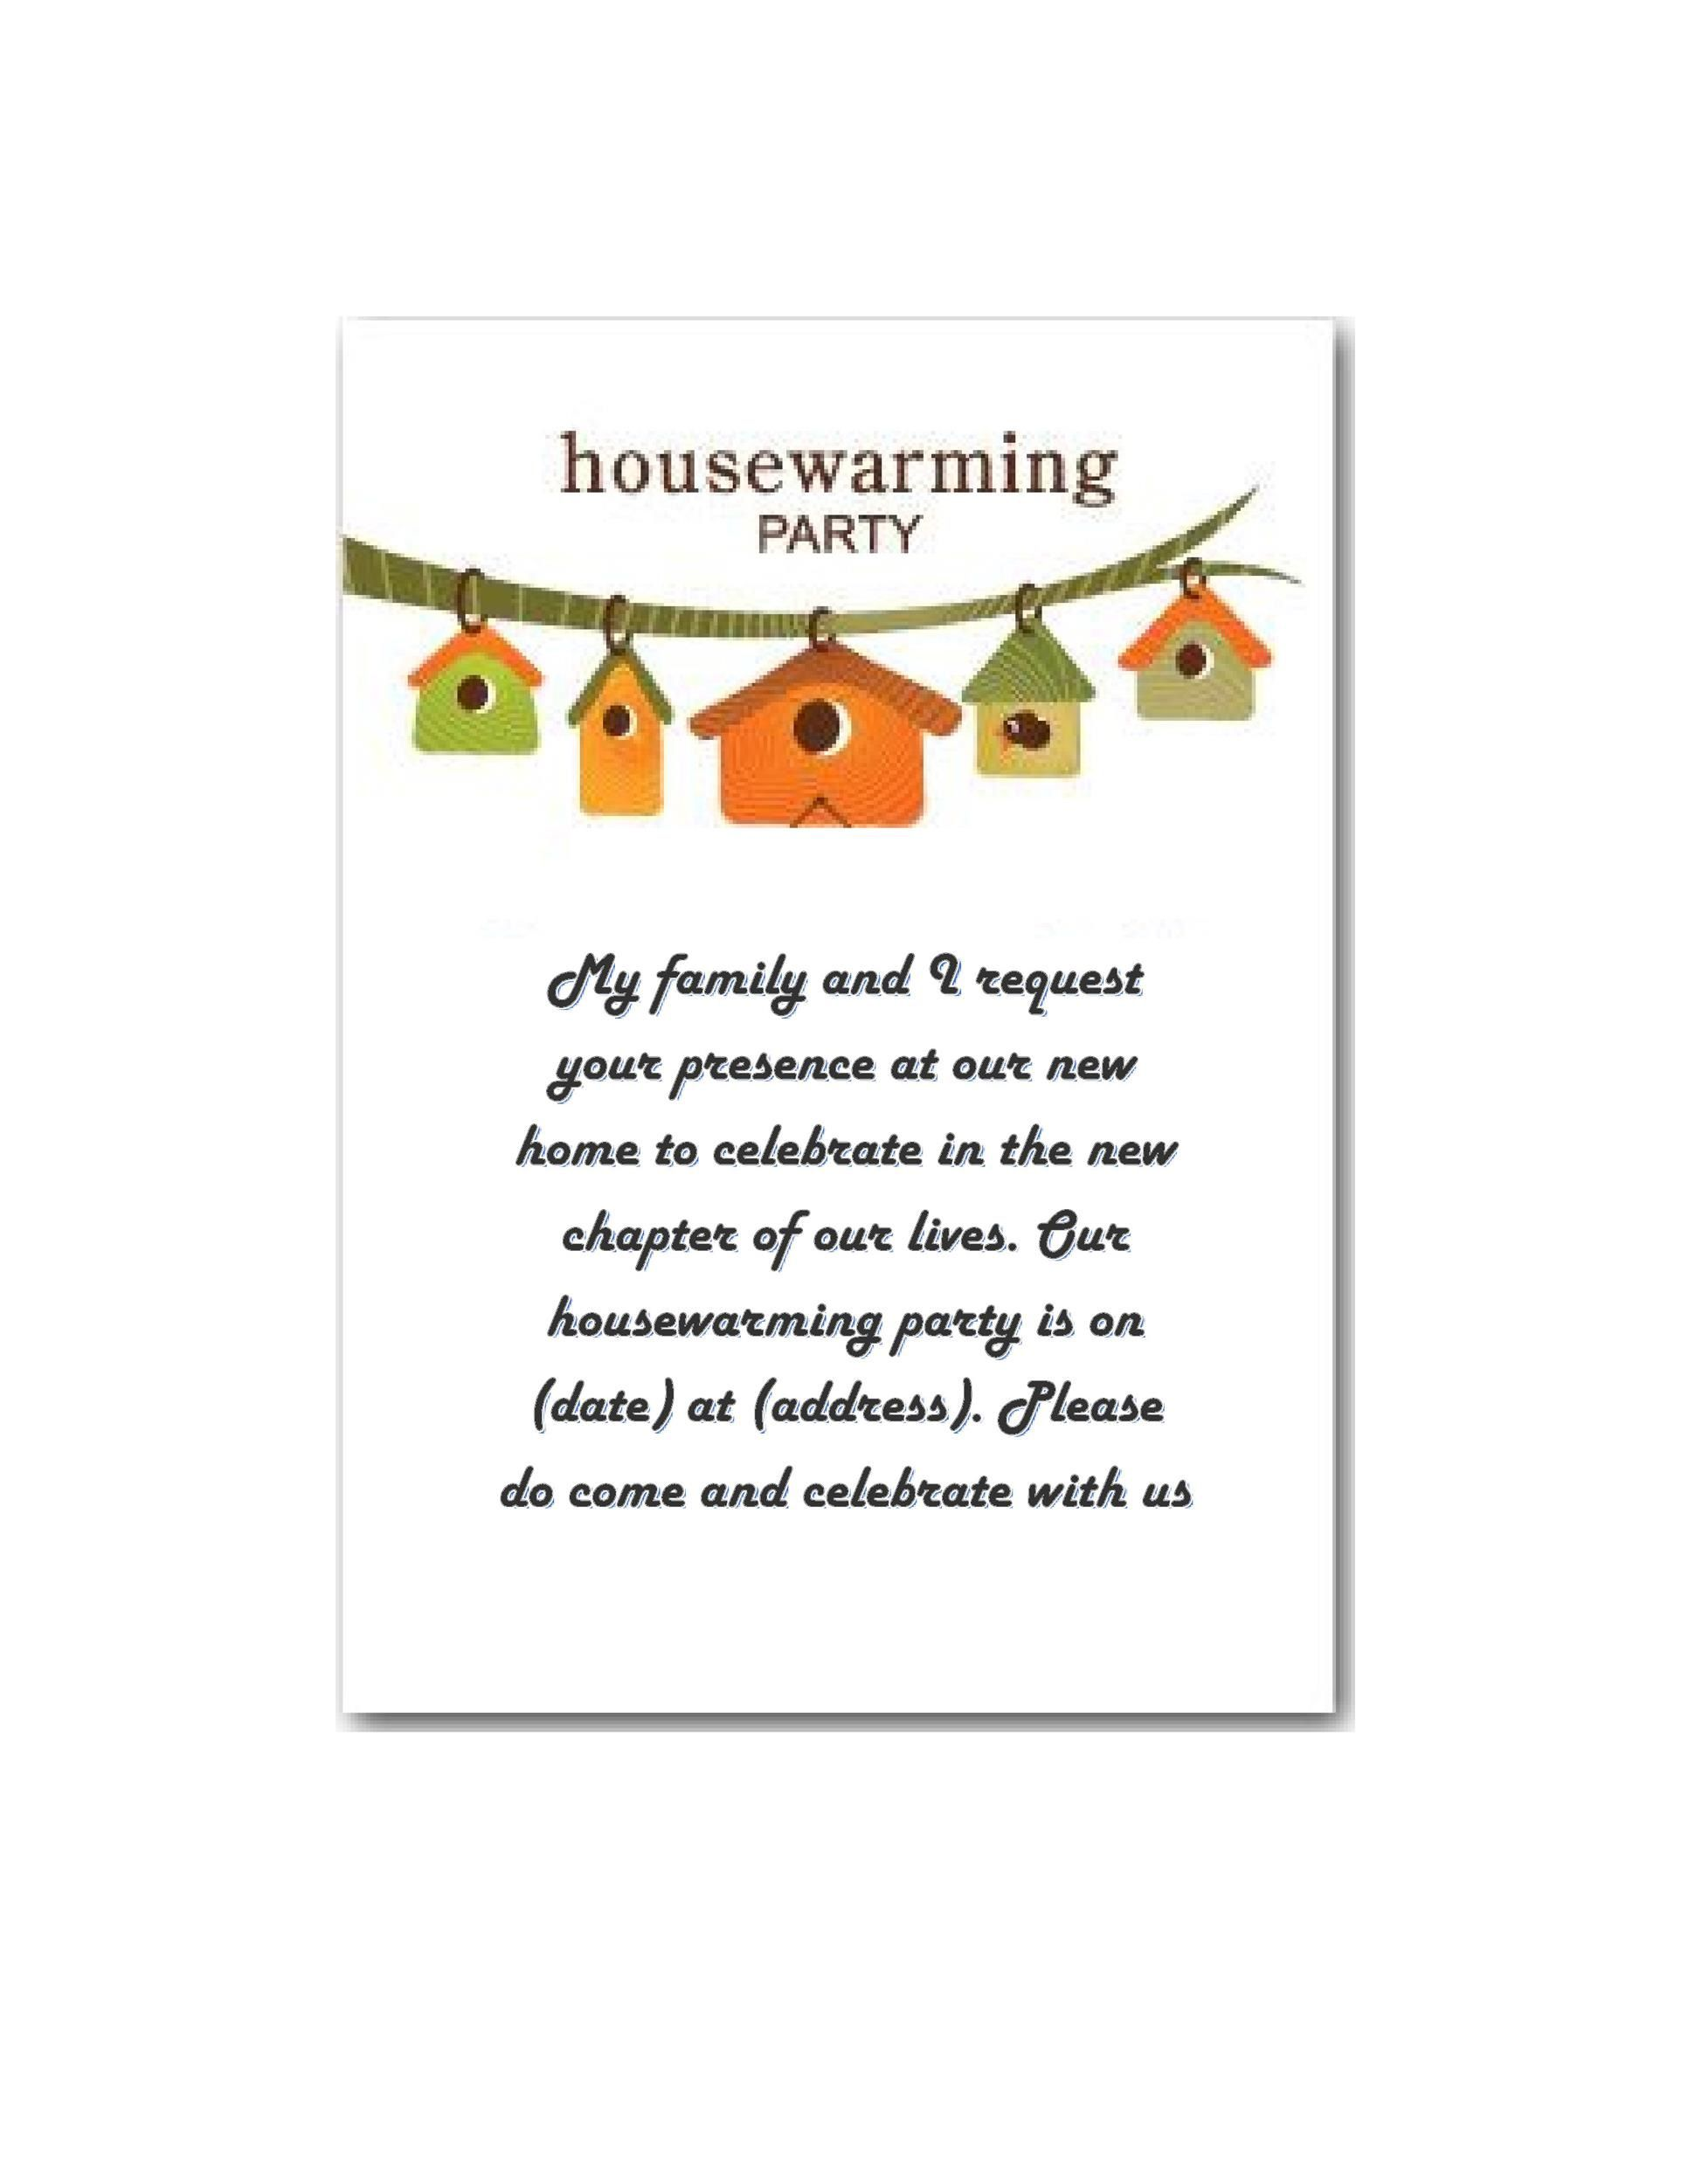 006 Striking Free Housewarming Invitation Template Photo  Templates Printable India Video DownloadFull